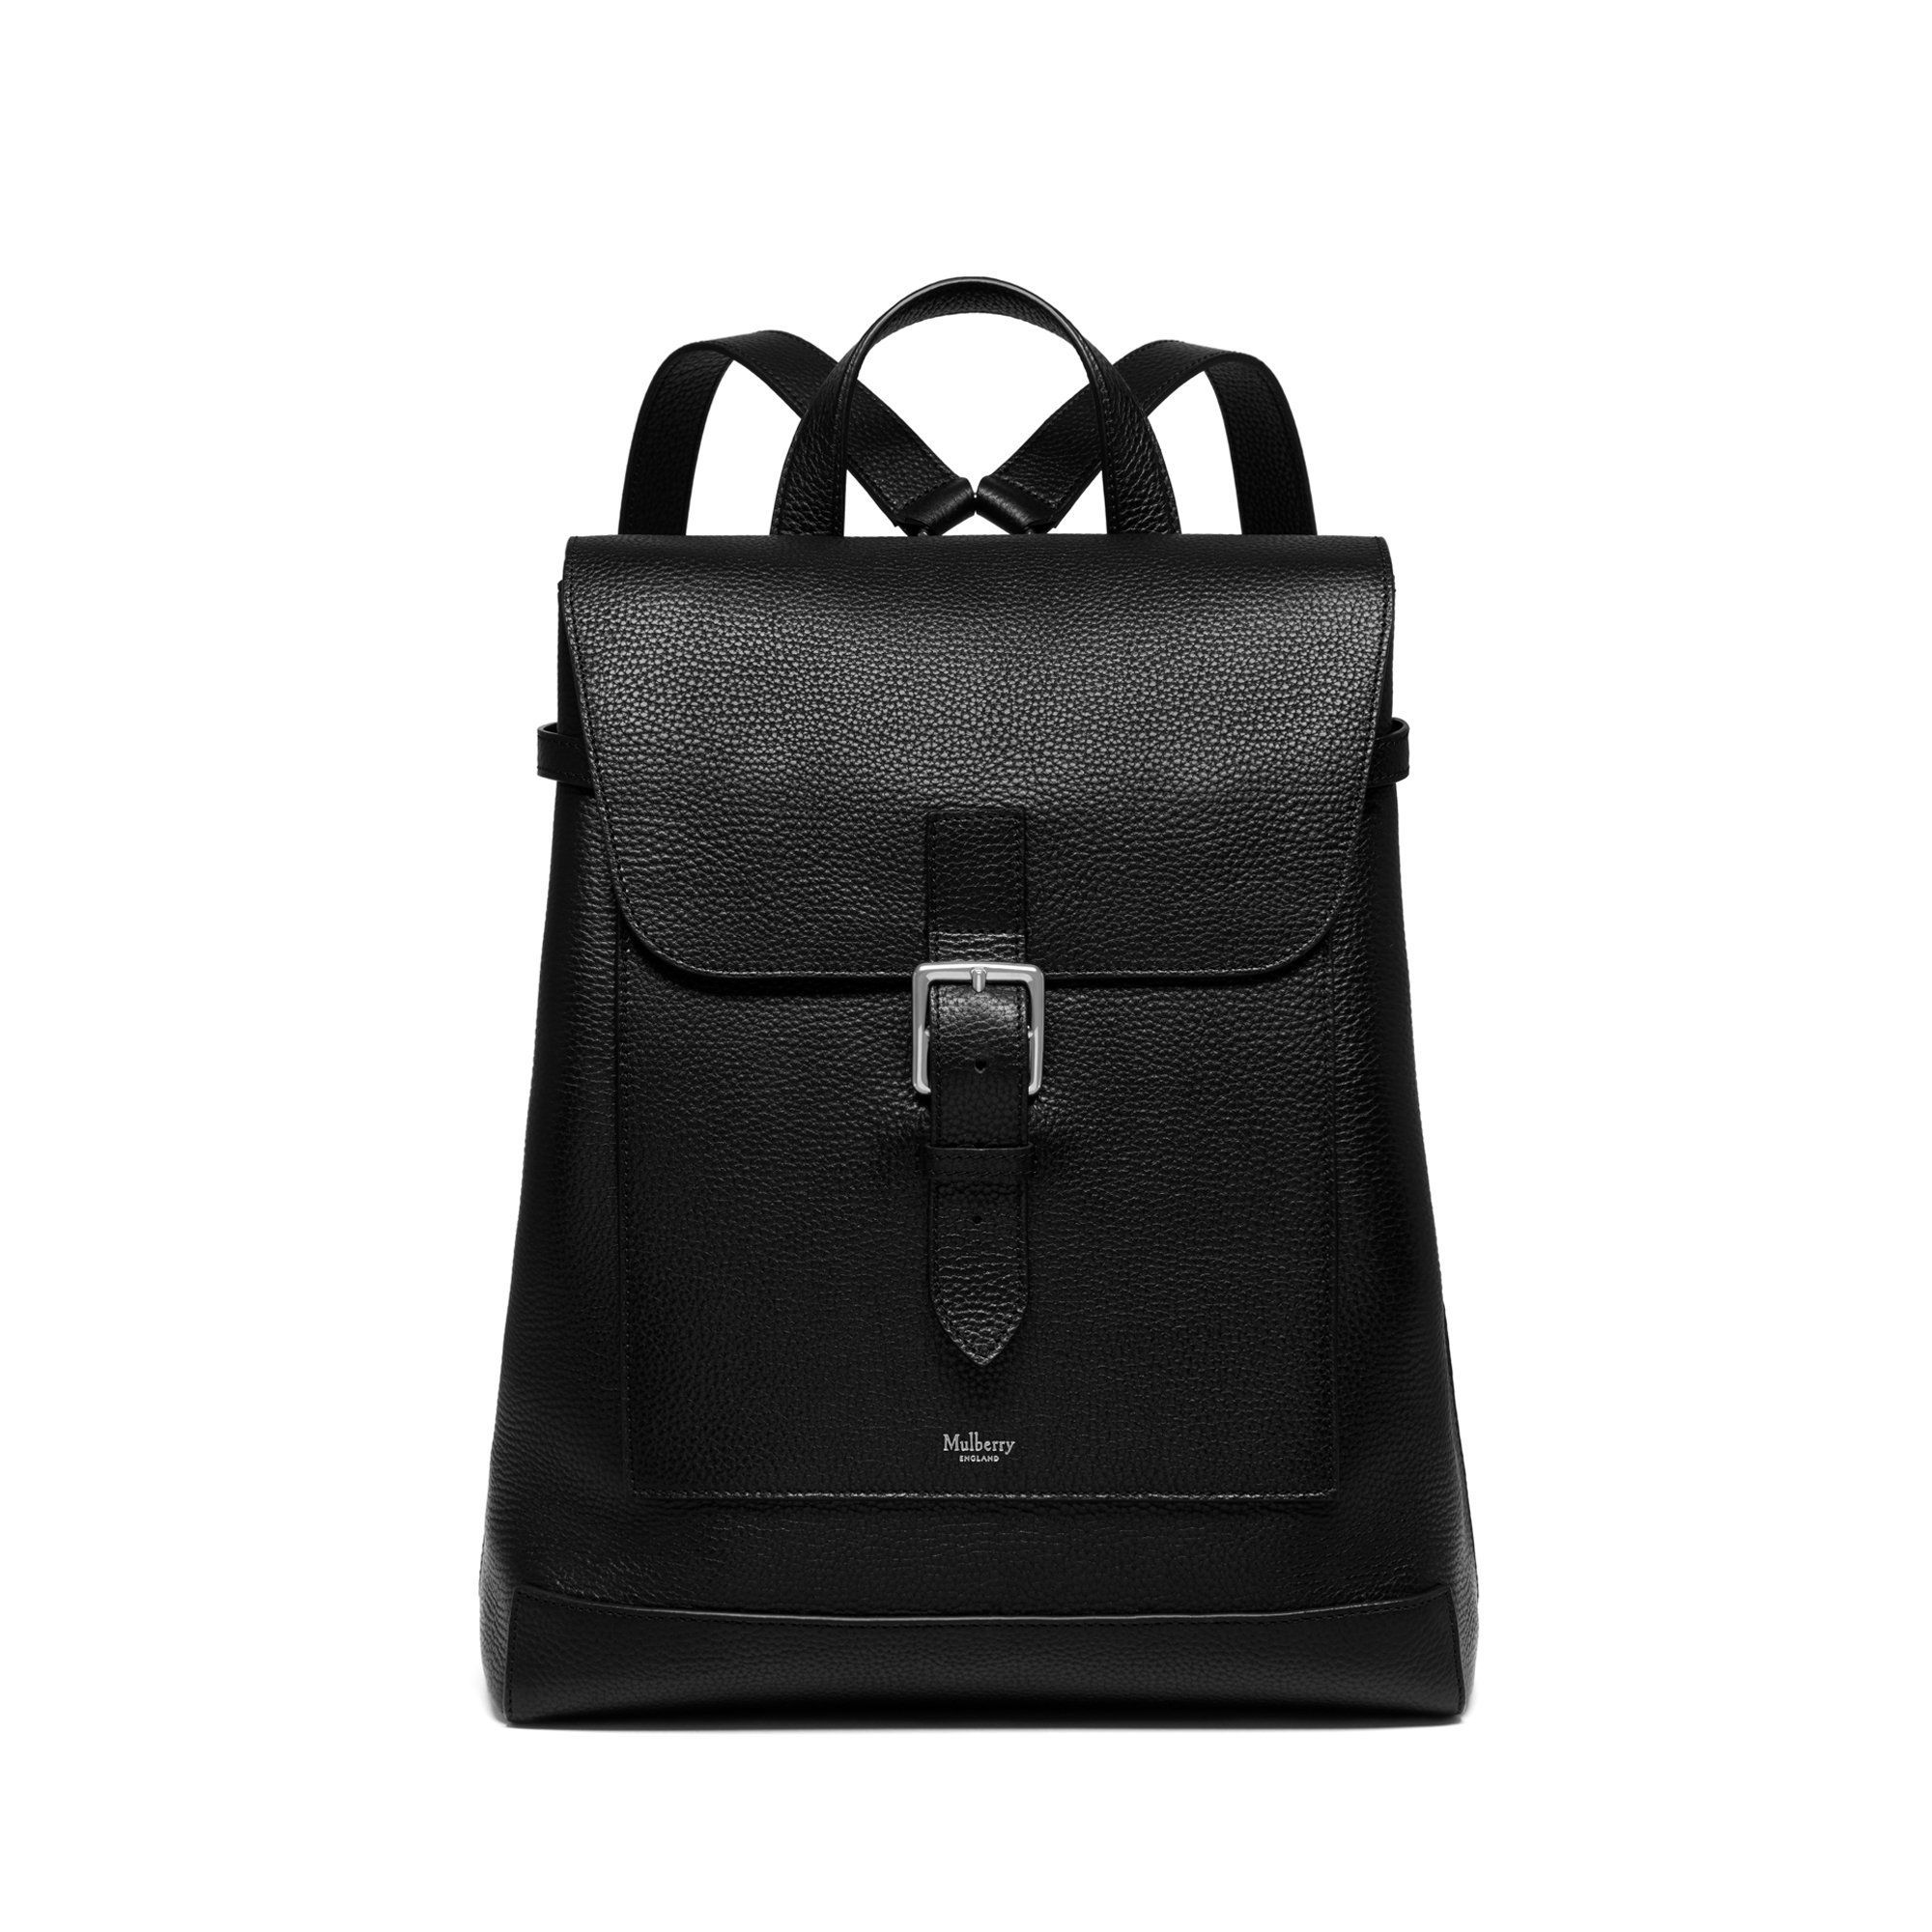 Рюкзаки airbас дорожные сумки, магазин, пе